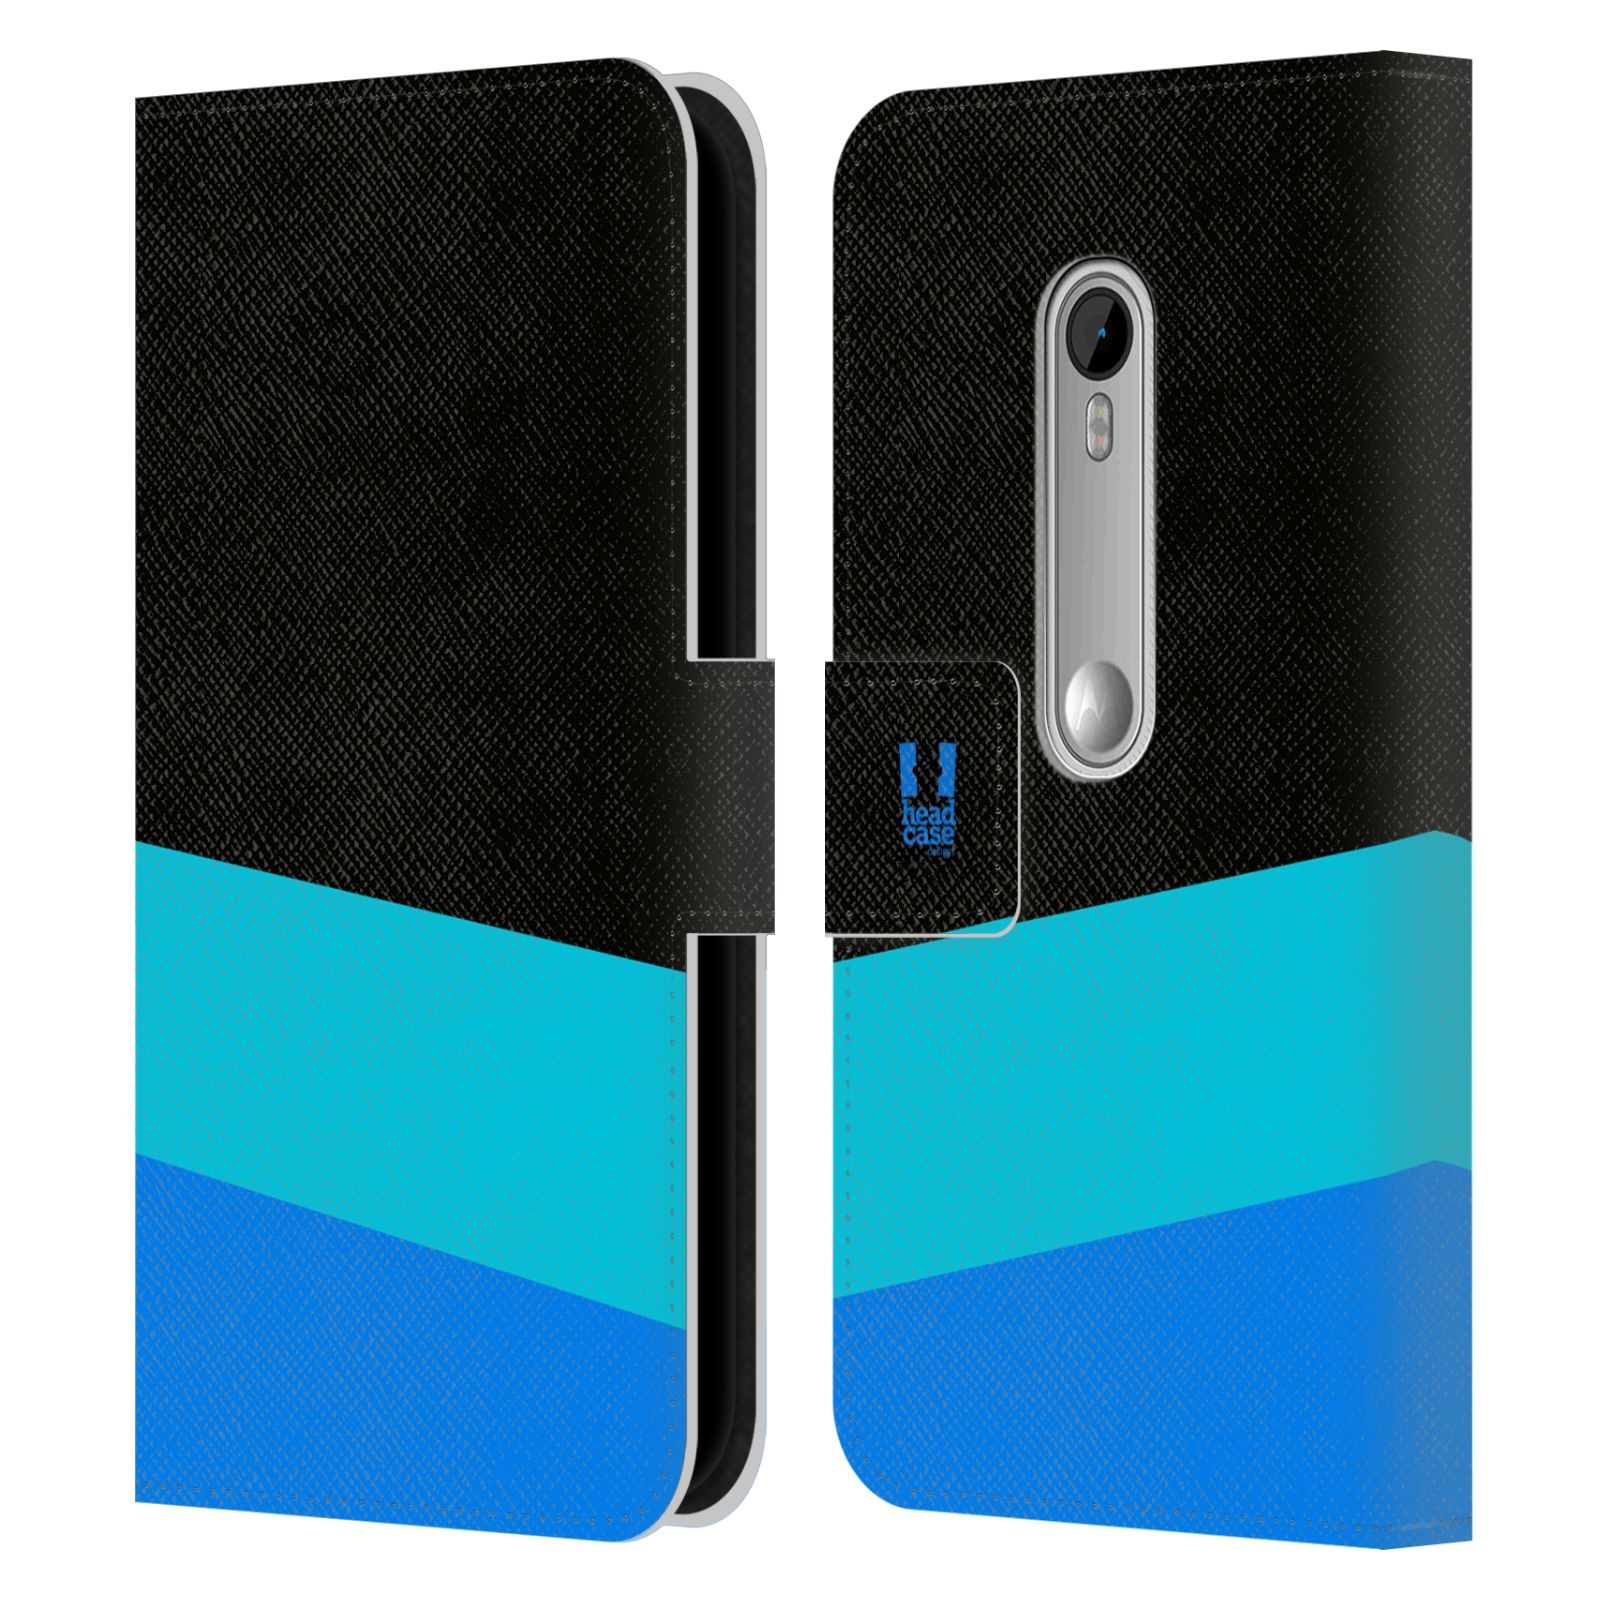 HEAD CASE Flipové pouzdro pro mobil Motorola MOTO G 3RD GENERATION barevné tvary modrá a černá FORMAL